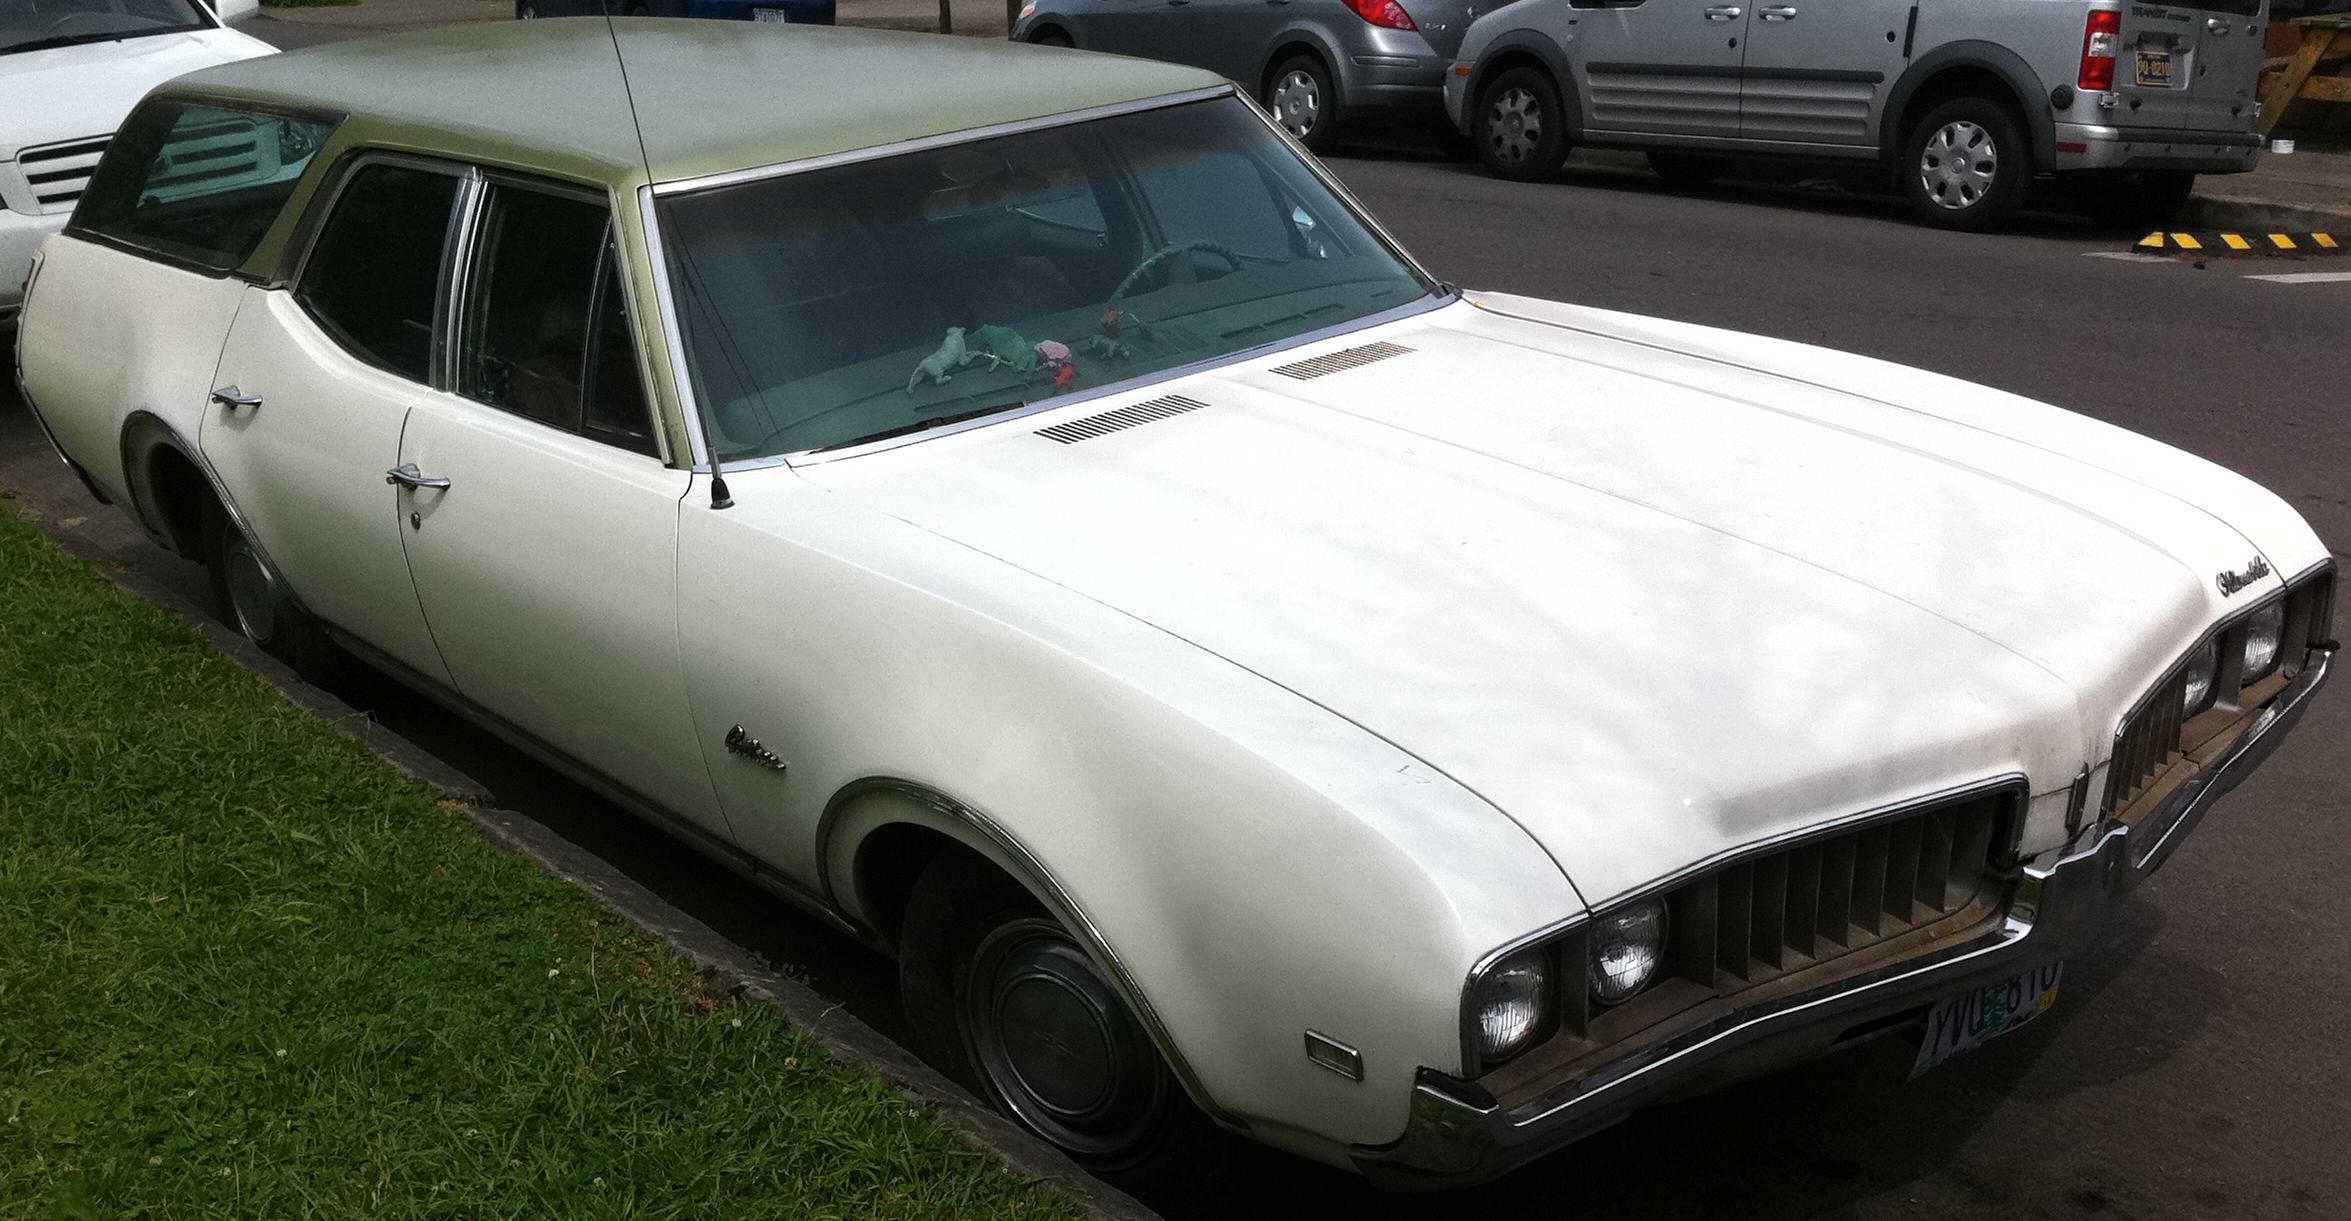 1969 Oldsmobile Cutlass Wagon